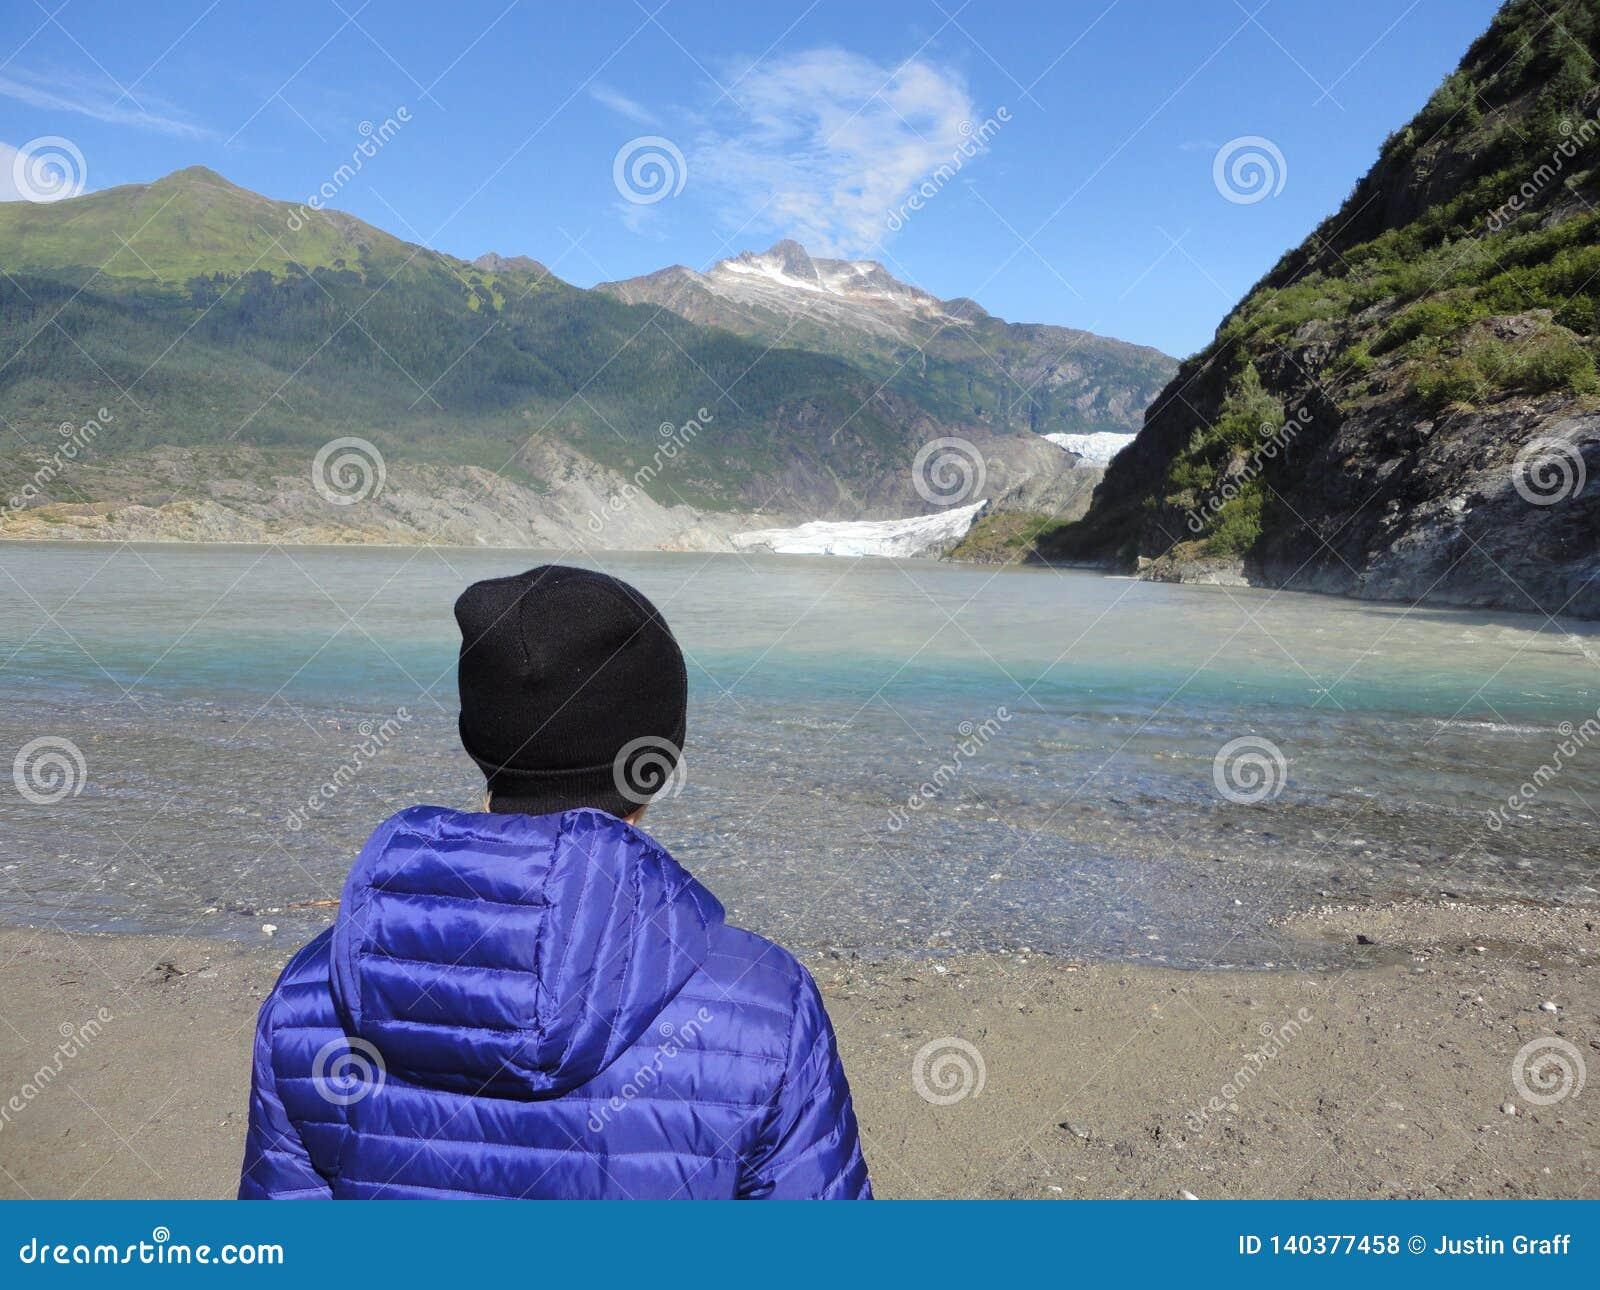 De Gletsjer Juneau Alaska van Mendenhall Mendenhallgletsjer die in Mendenhall-Meer toevloeien - tussen bergen met Goudklompje val